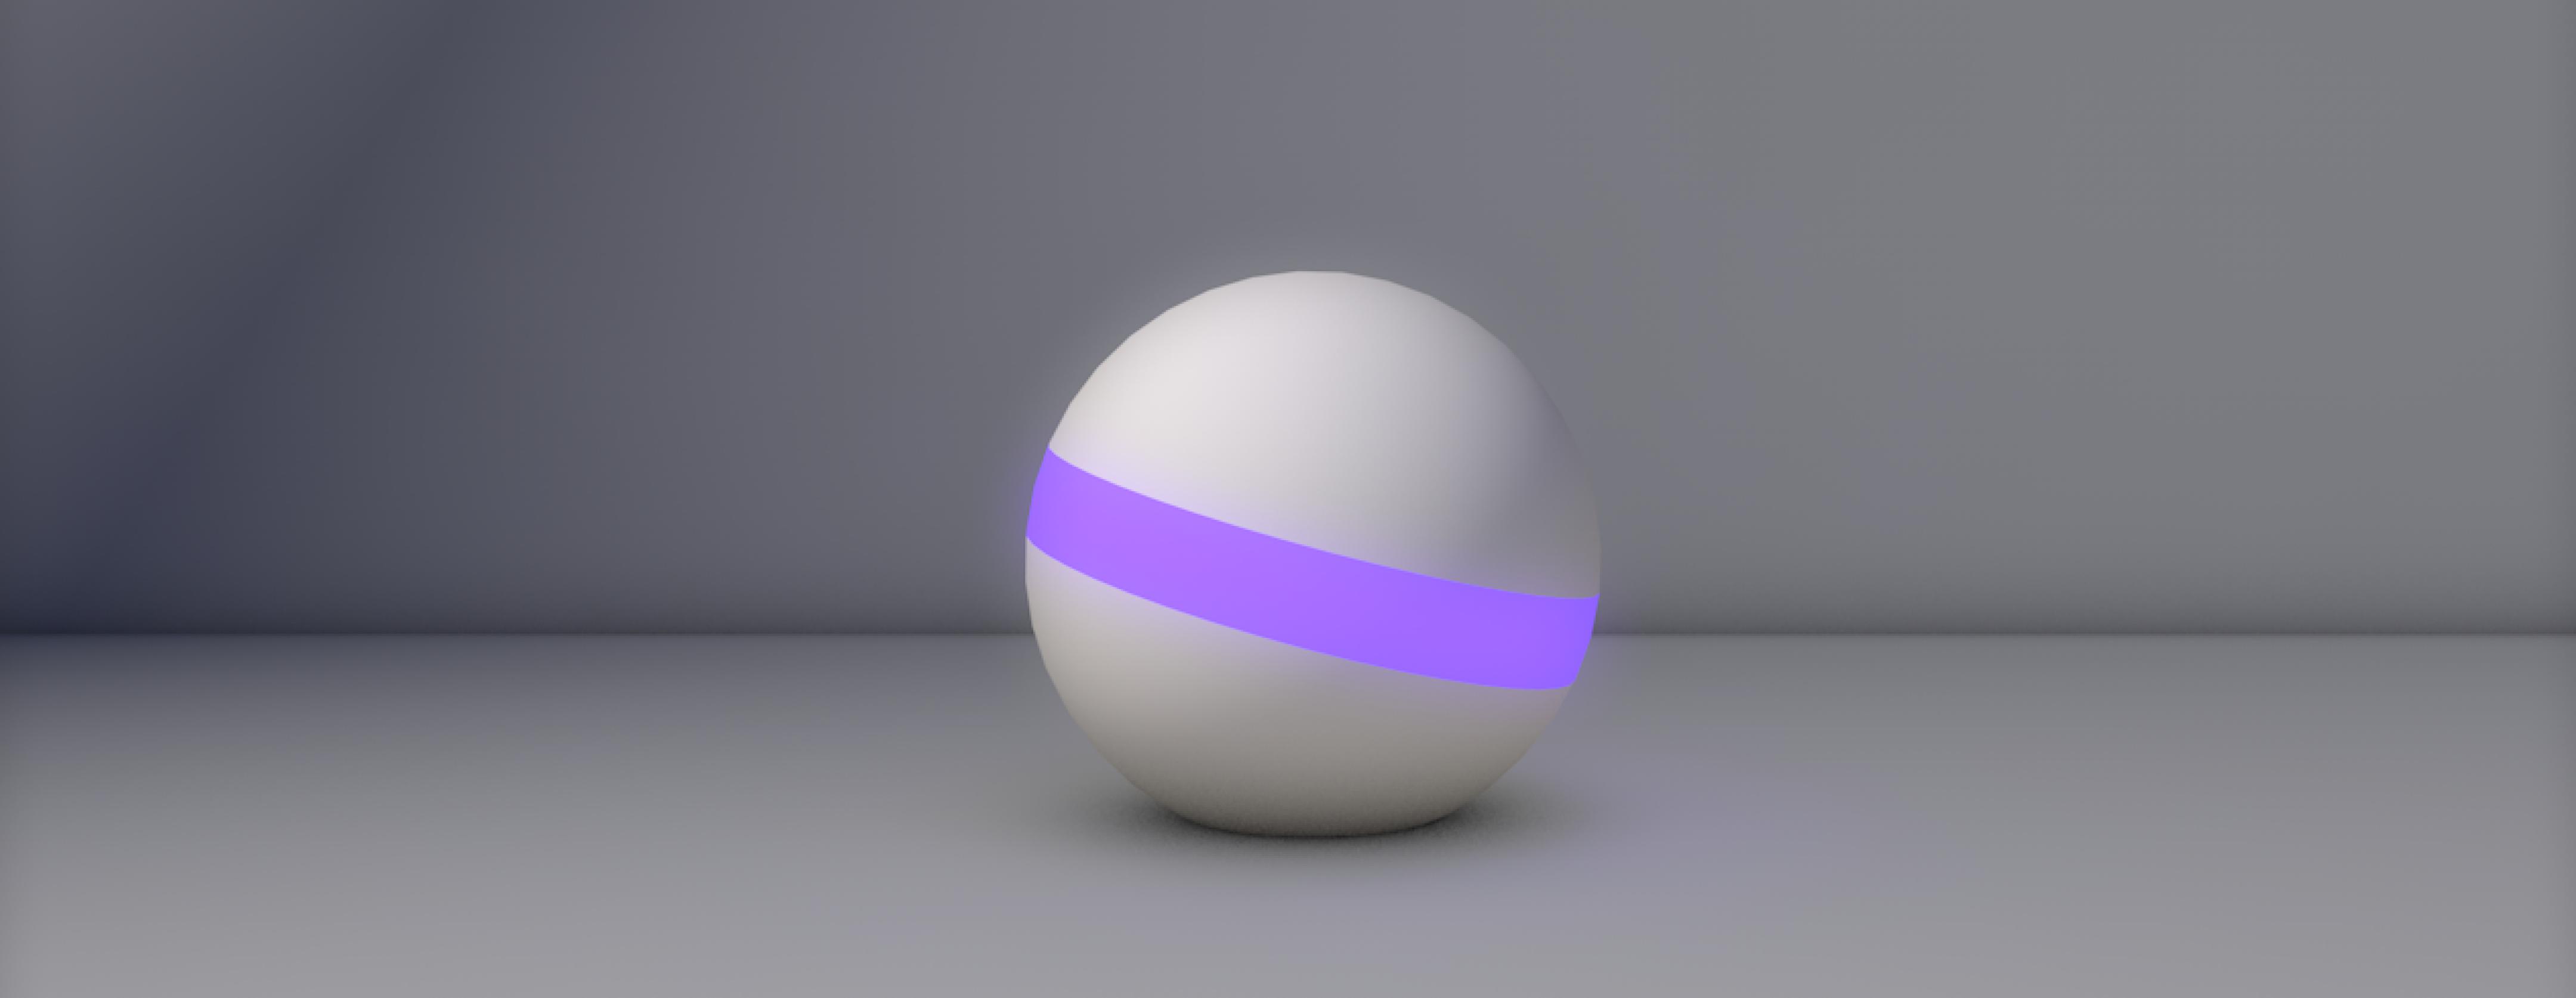 3D rendering of the Oobi device